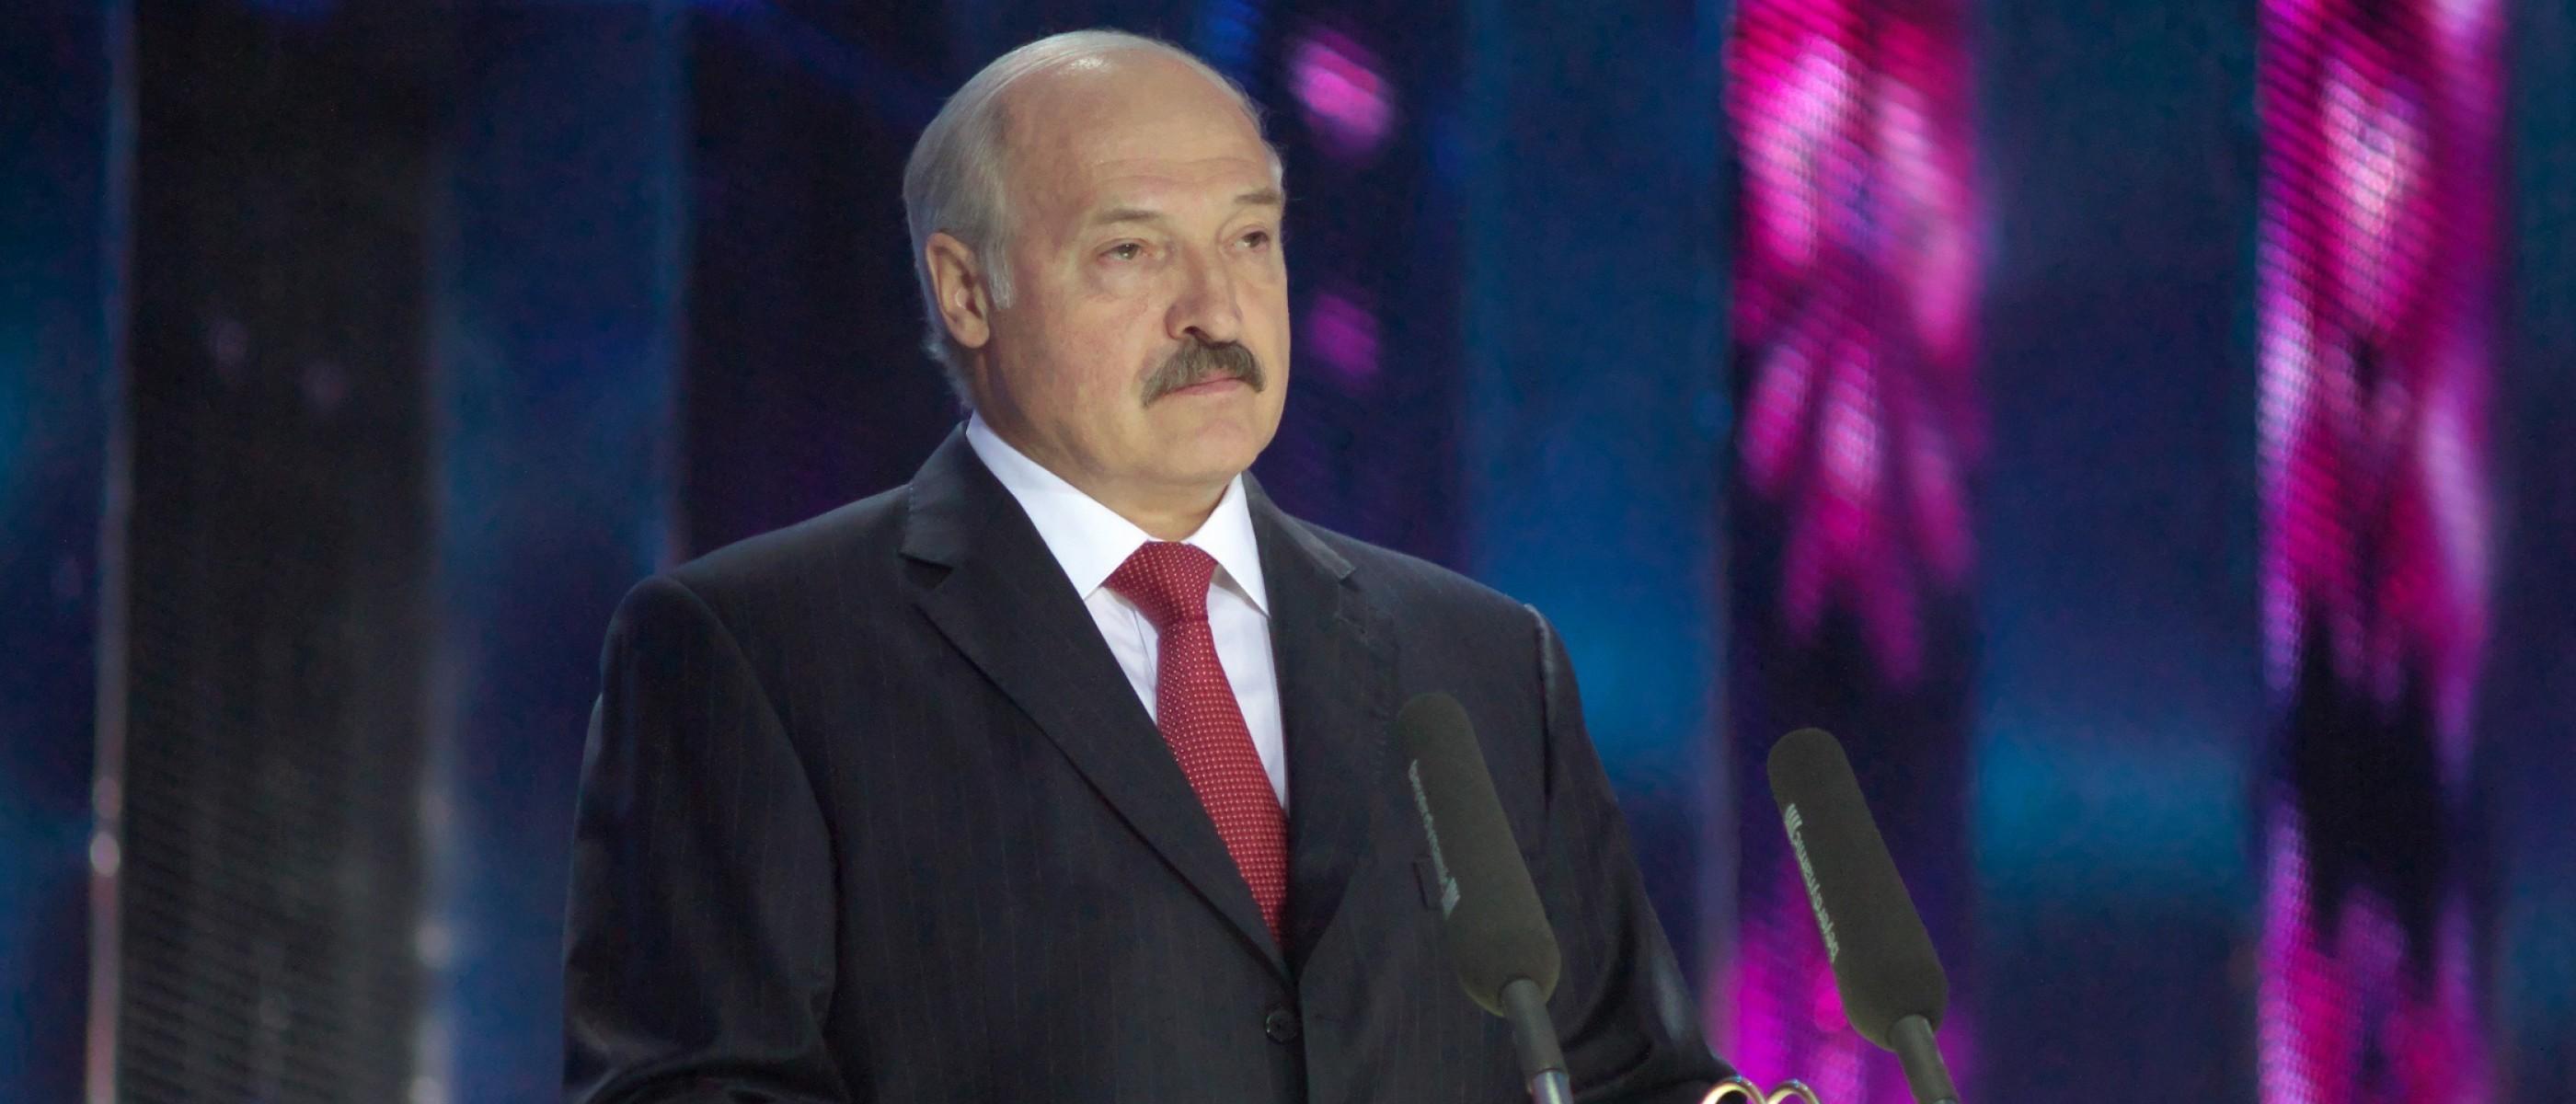 belarus - photo #31